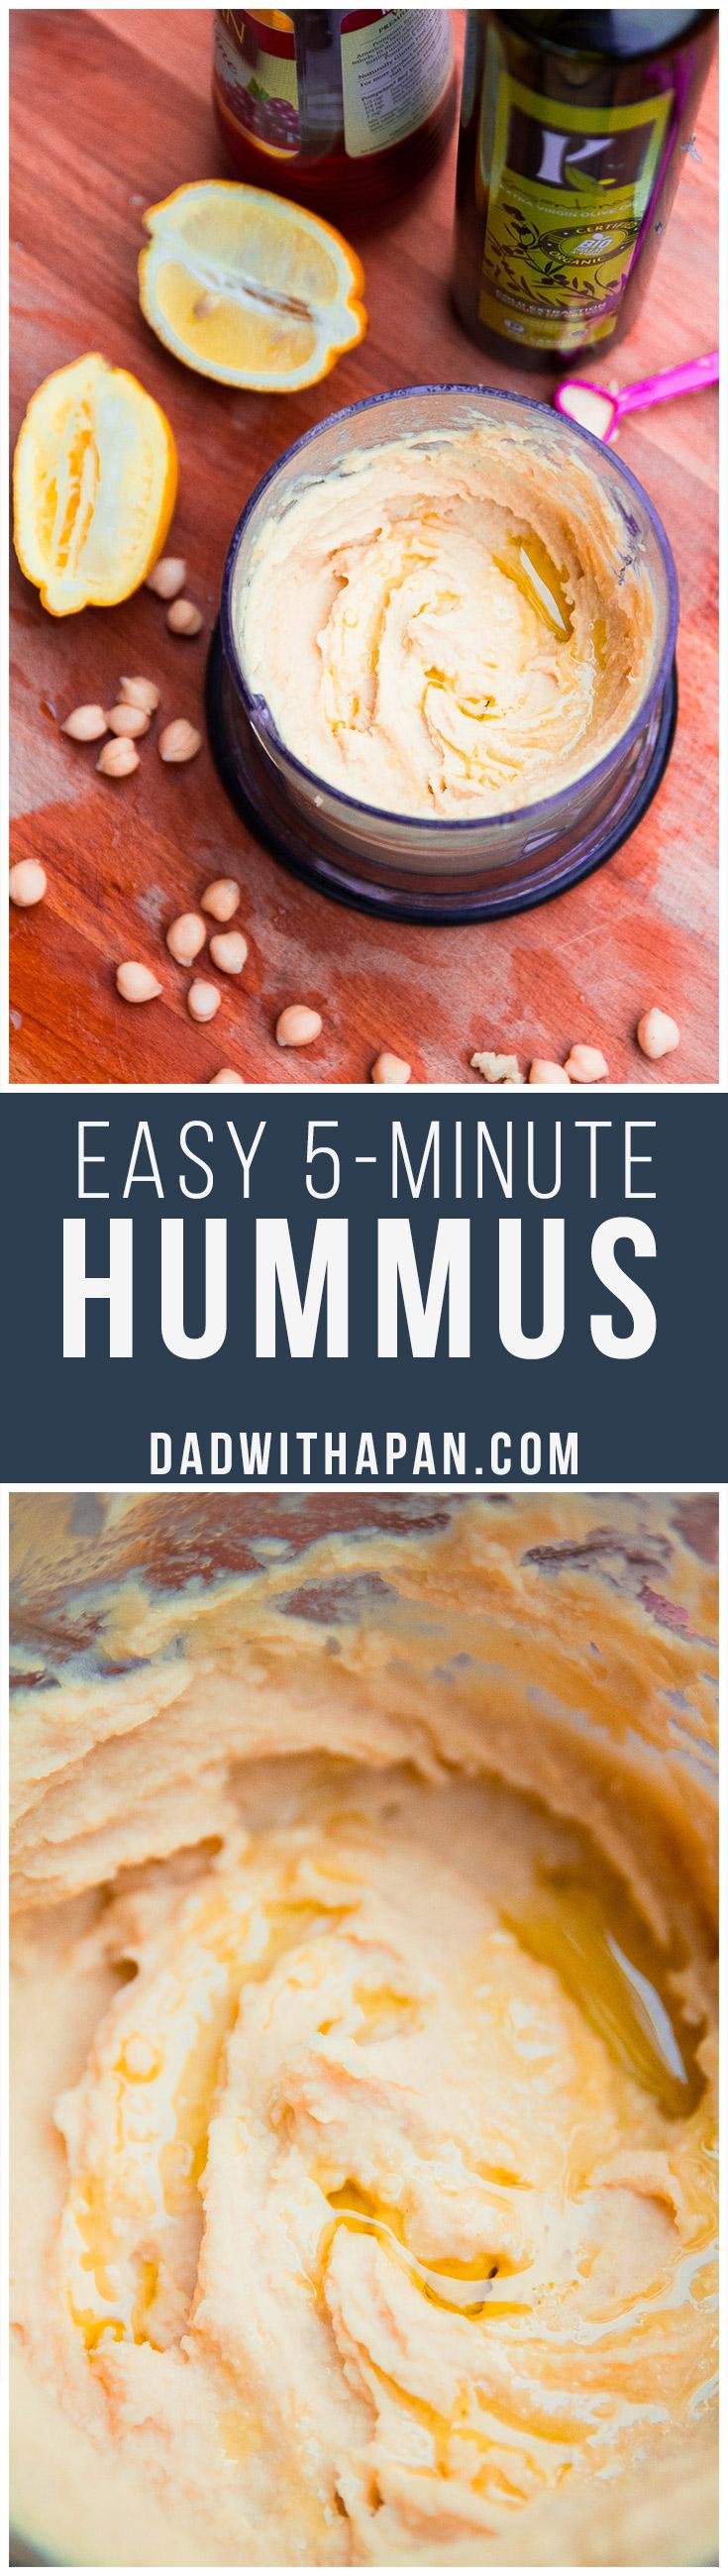 Easy 5-Minute Hummus